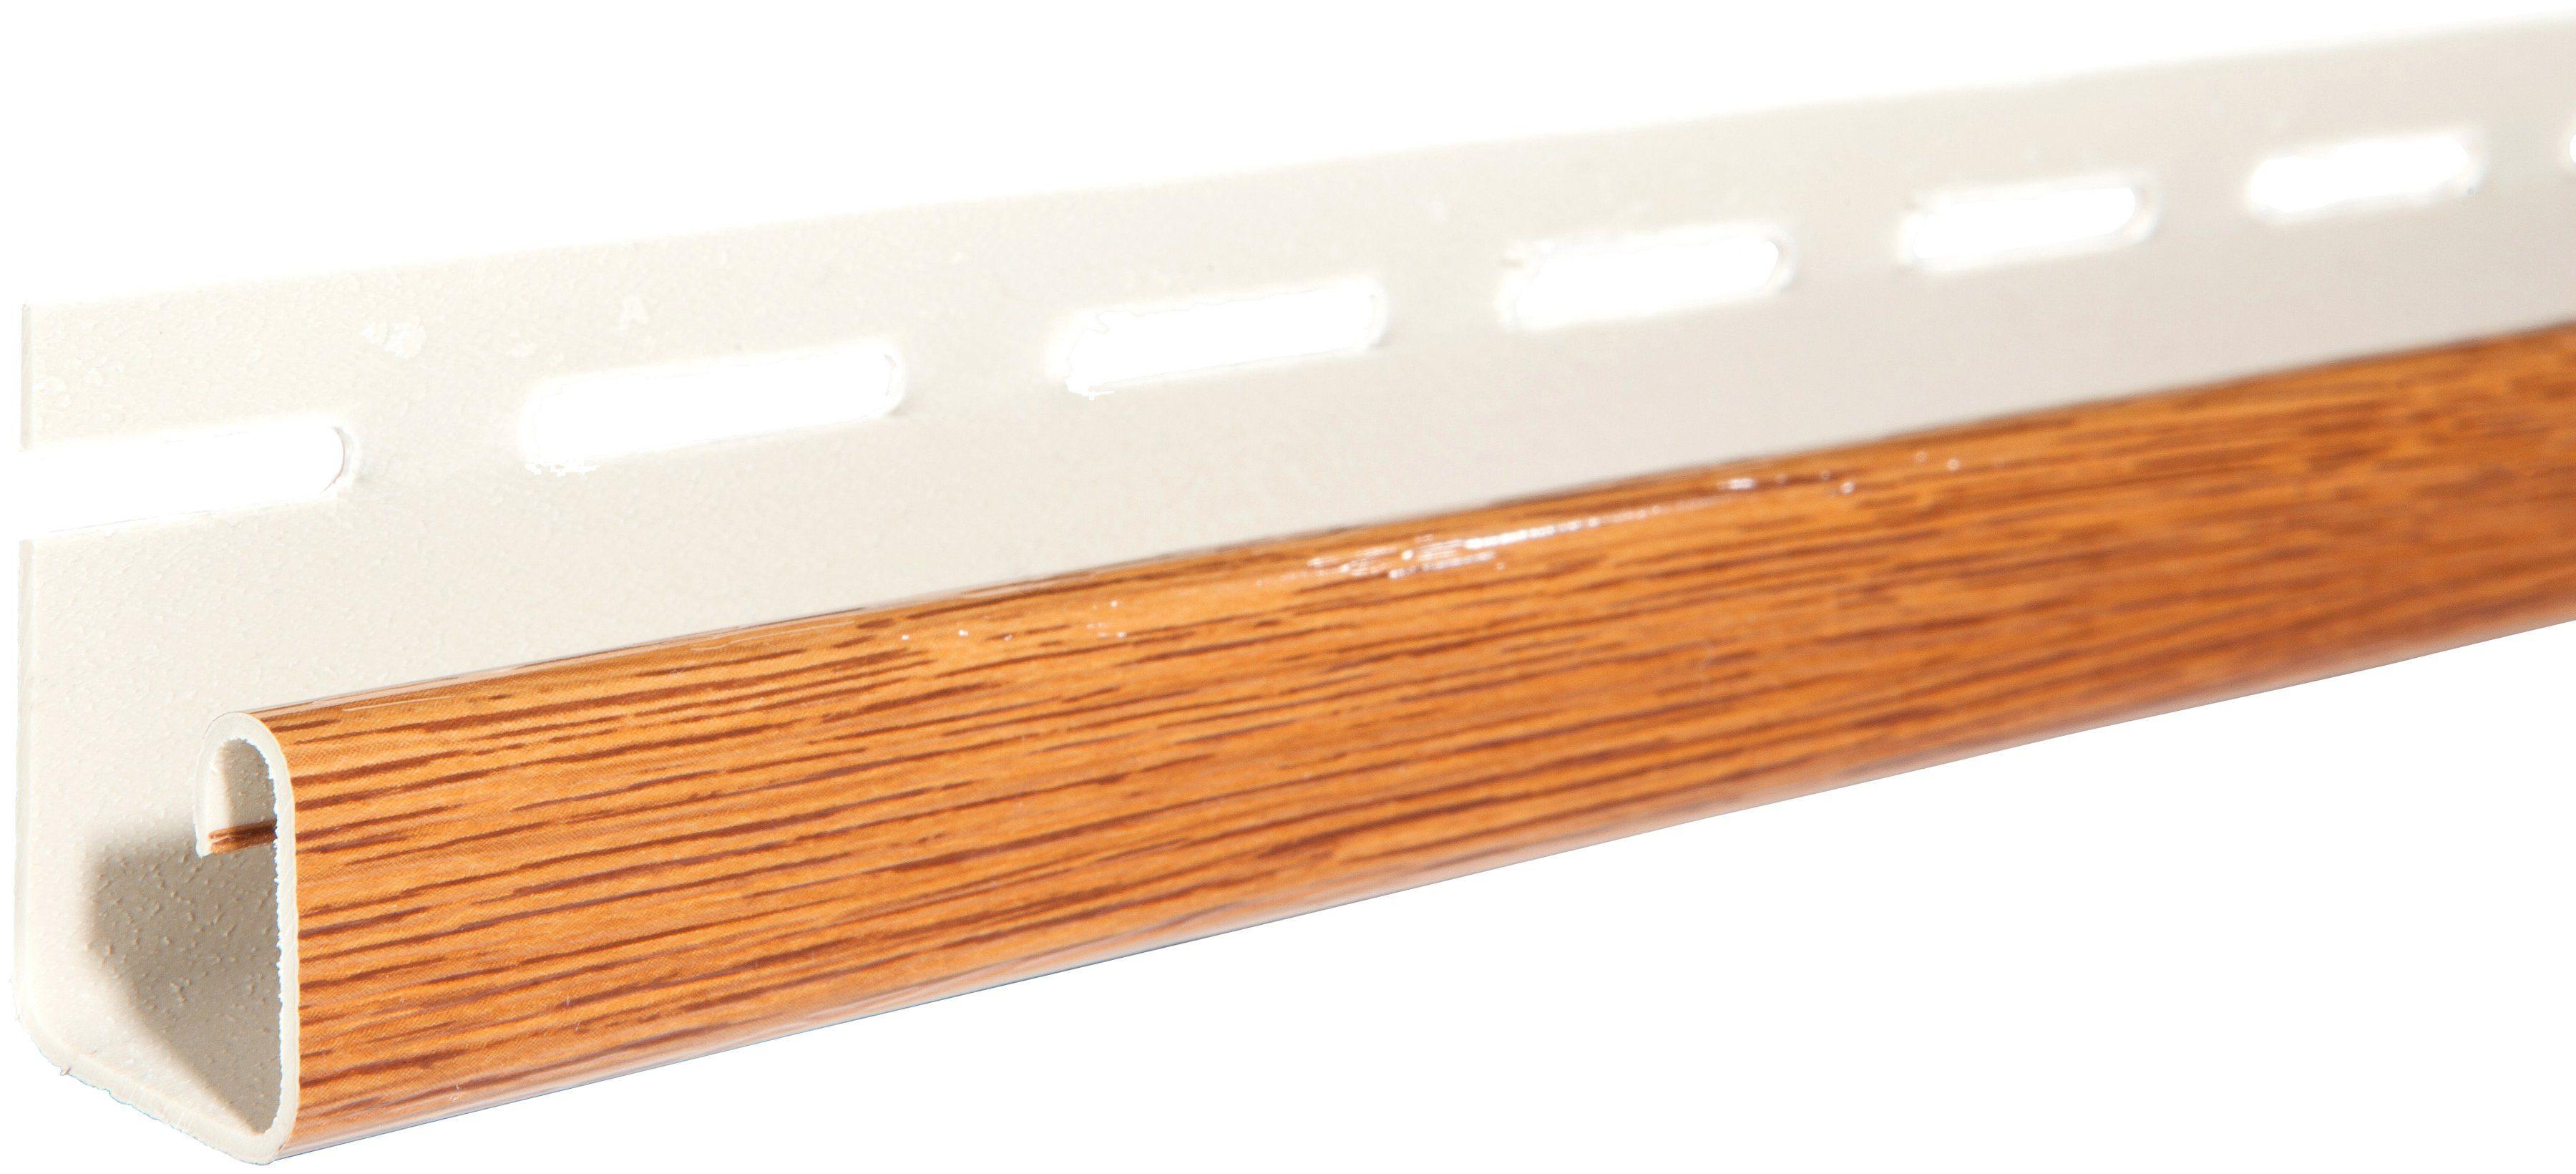 BAUKULIT Set: Abschlussprofil »SOFFIT Golden Oak«, für Dachüberstand, 4er Set, je 1,525 m